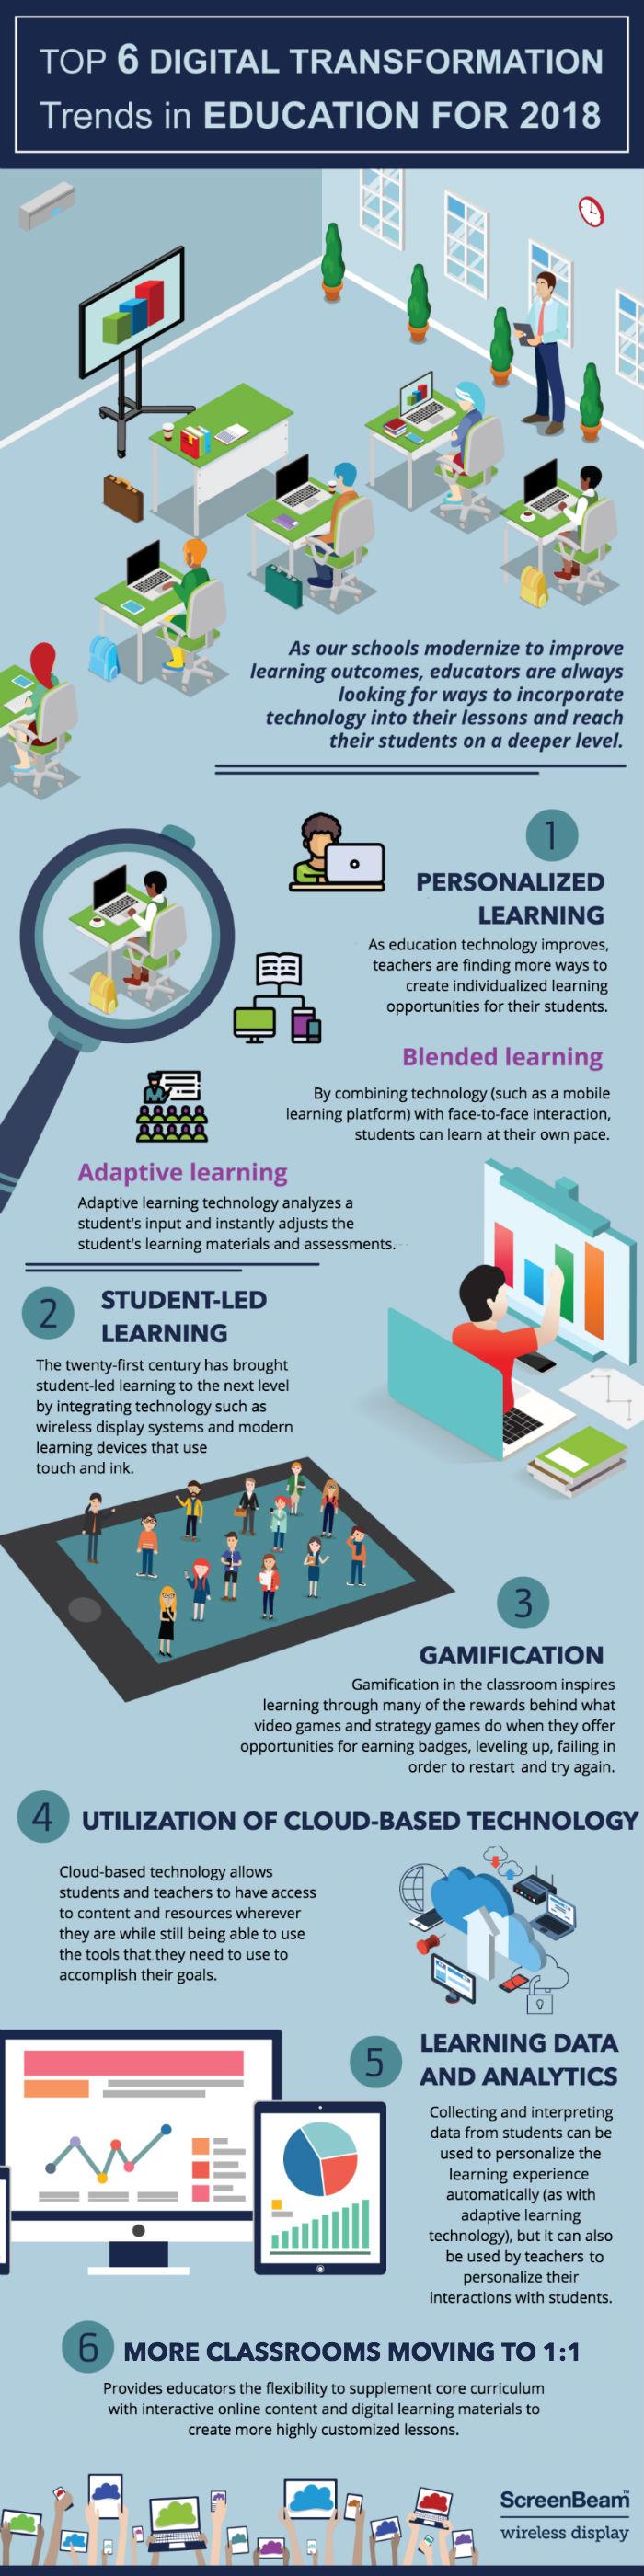 digital transformations in education